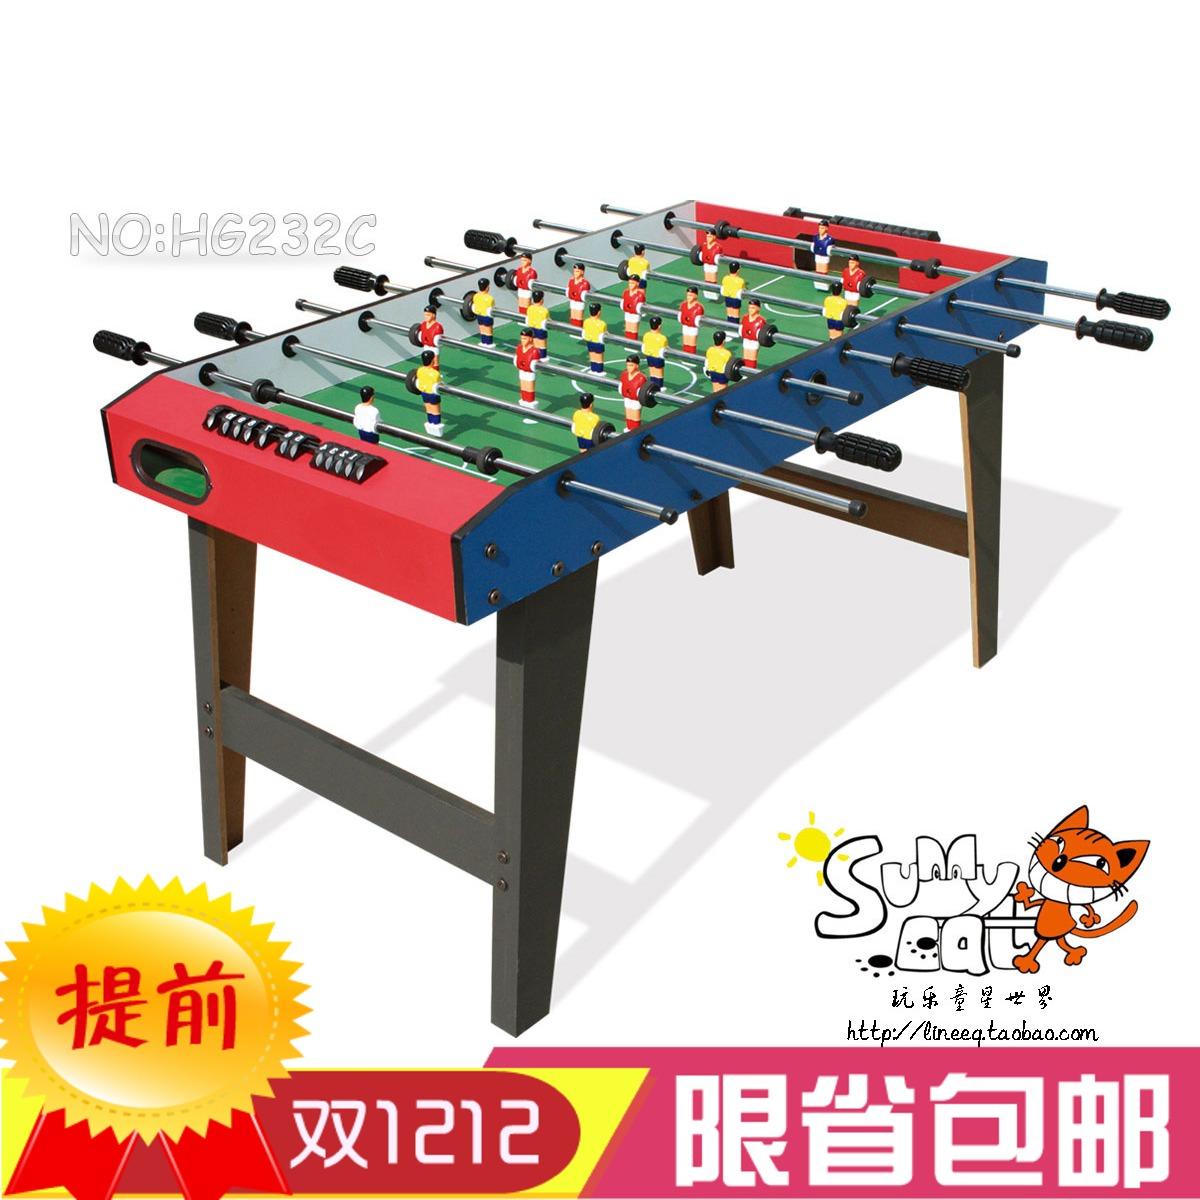 Стол для настольного футбола Crown hg232c